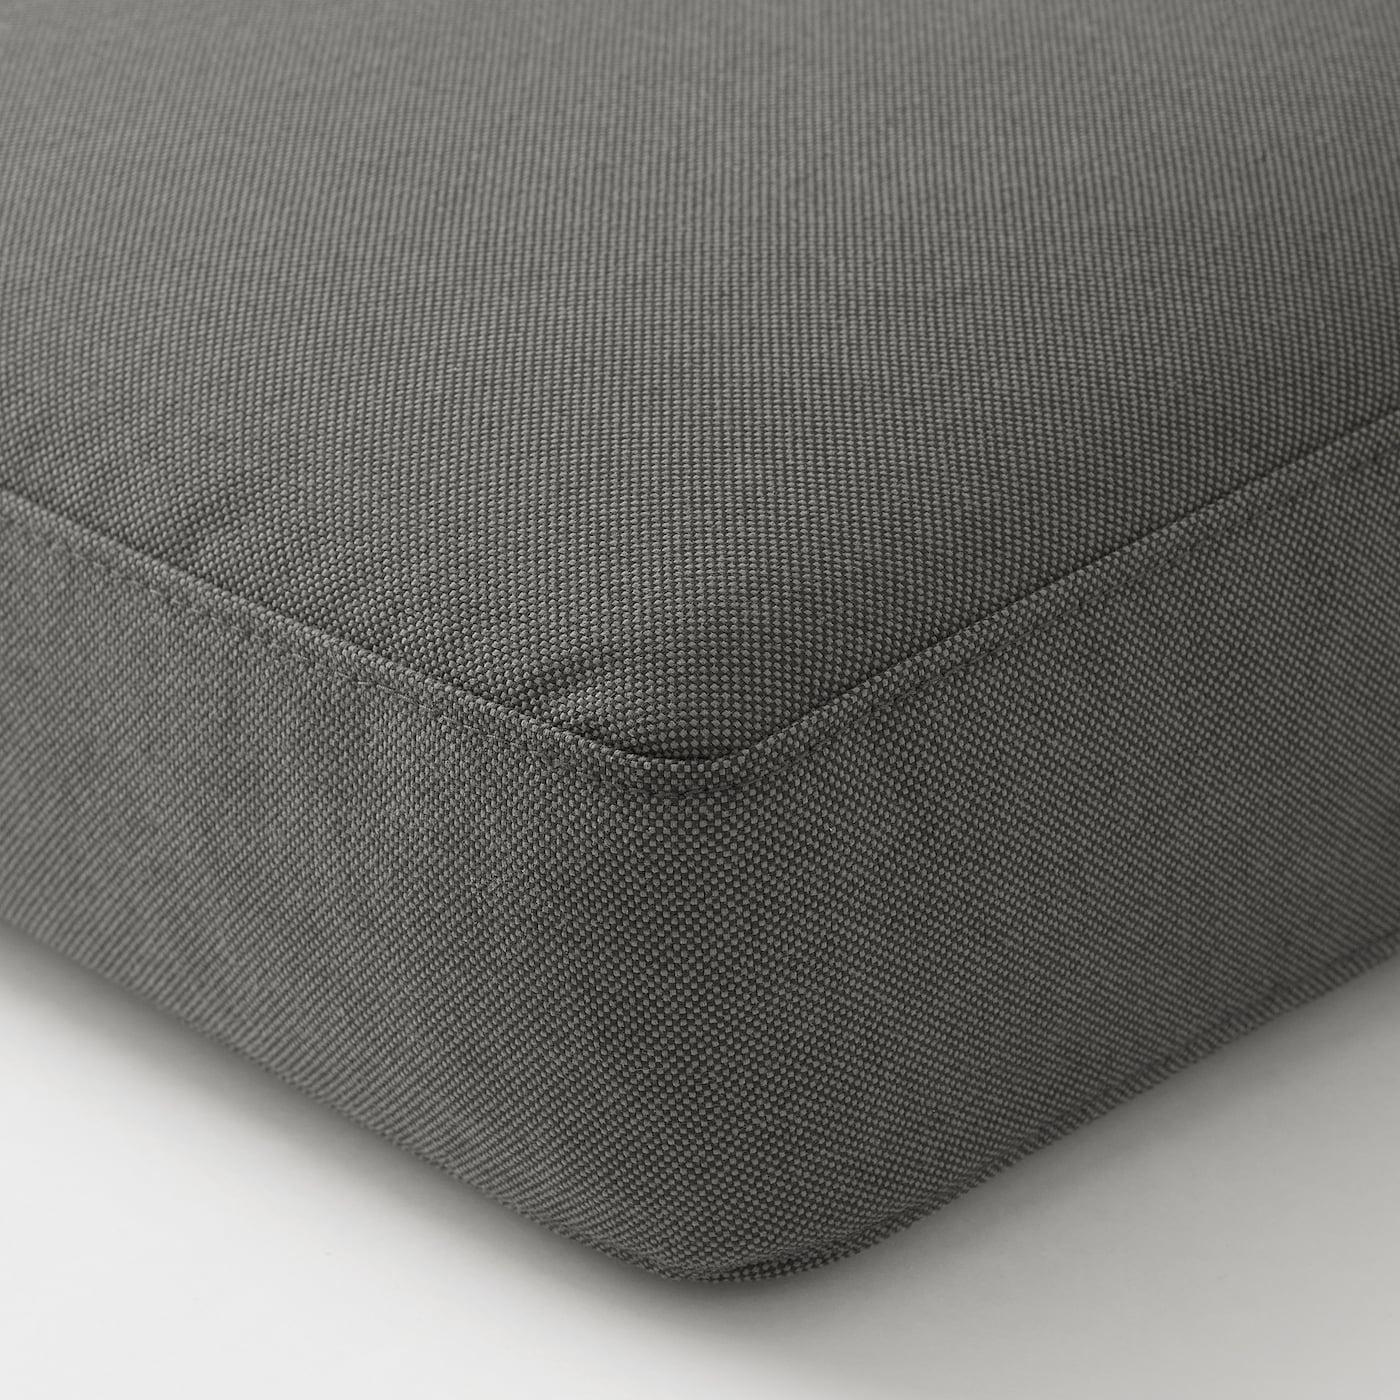 Picture of: Froson Duvholmen Seat Pad Outdoor Dark Gray Ikea